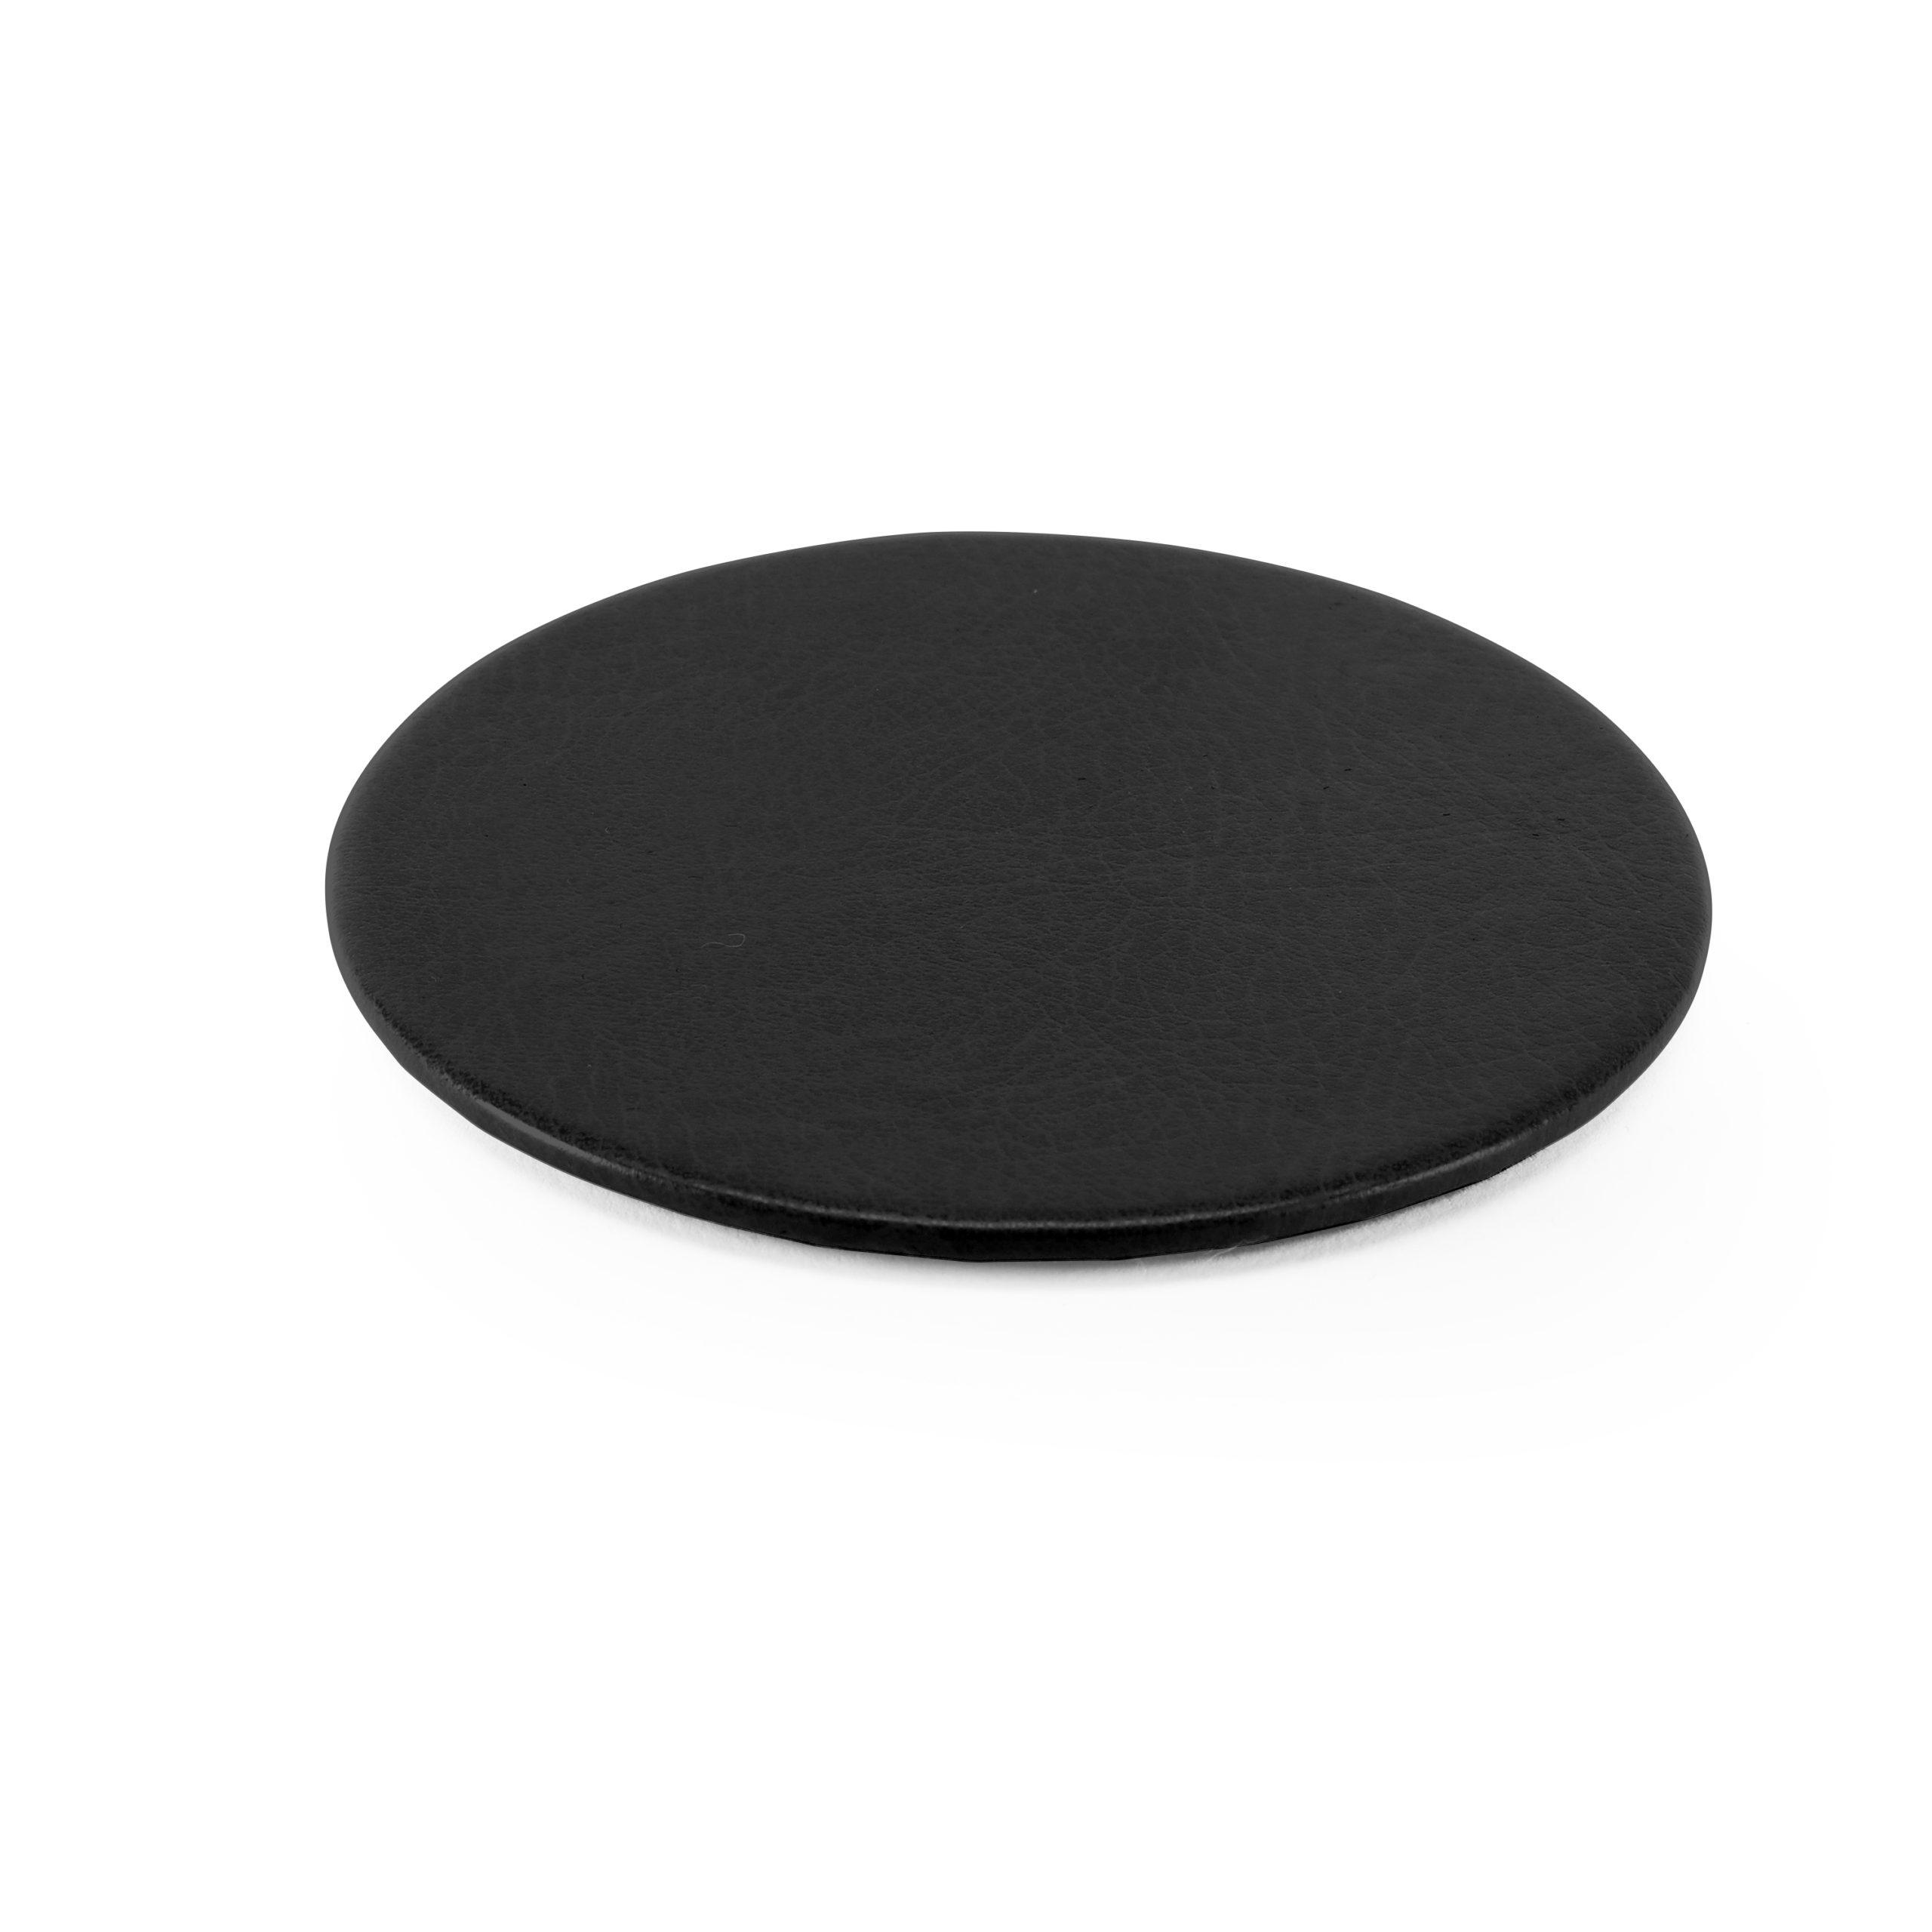 Lifestyle Round Coaster in Black